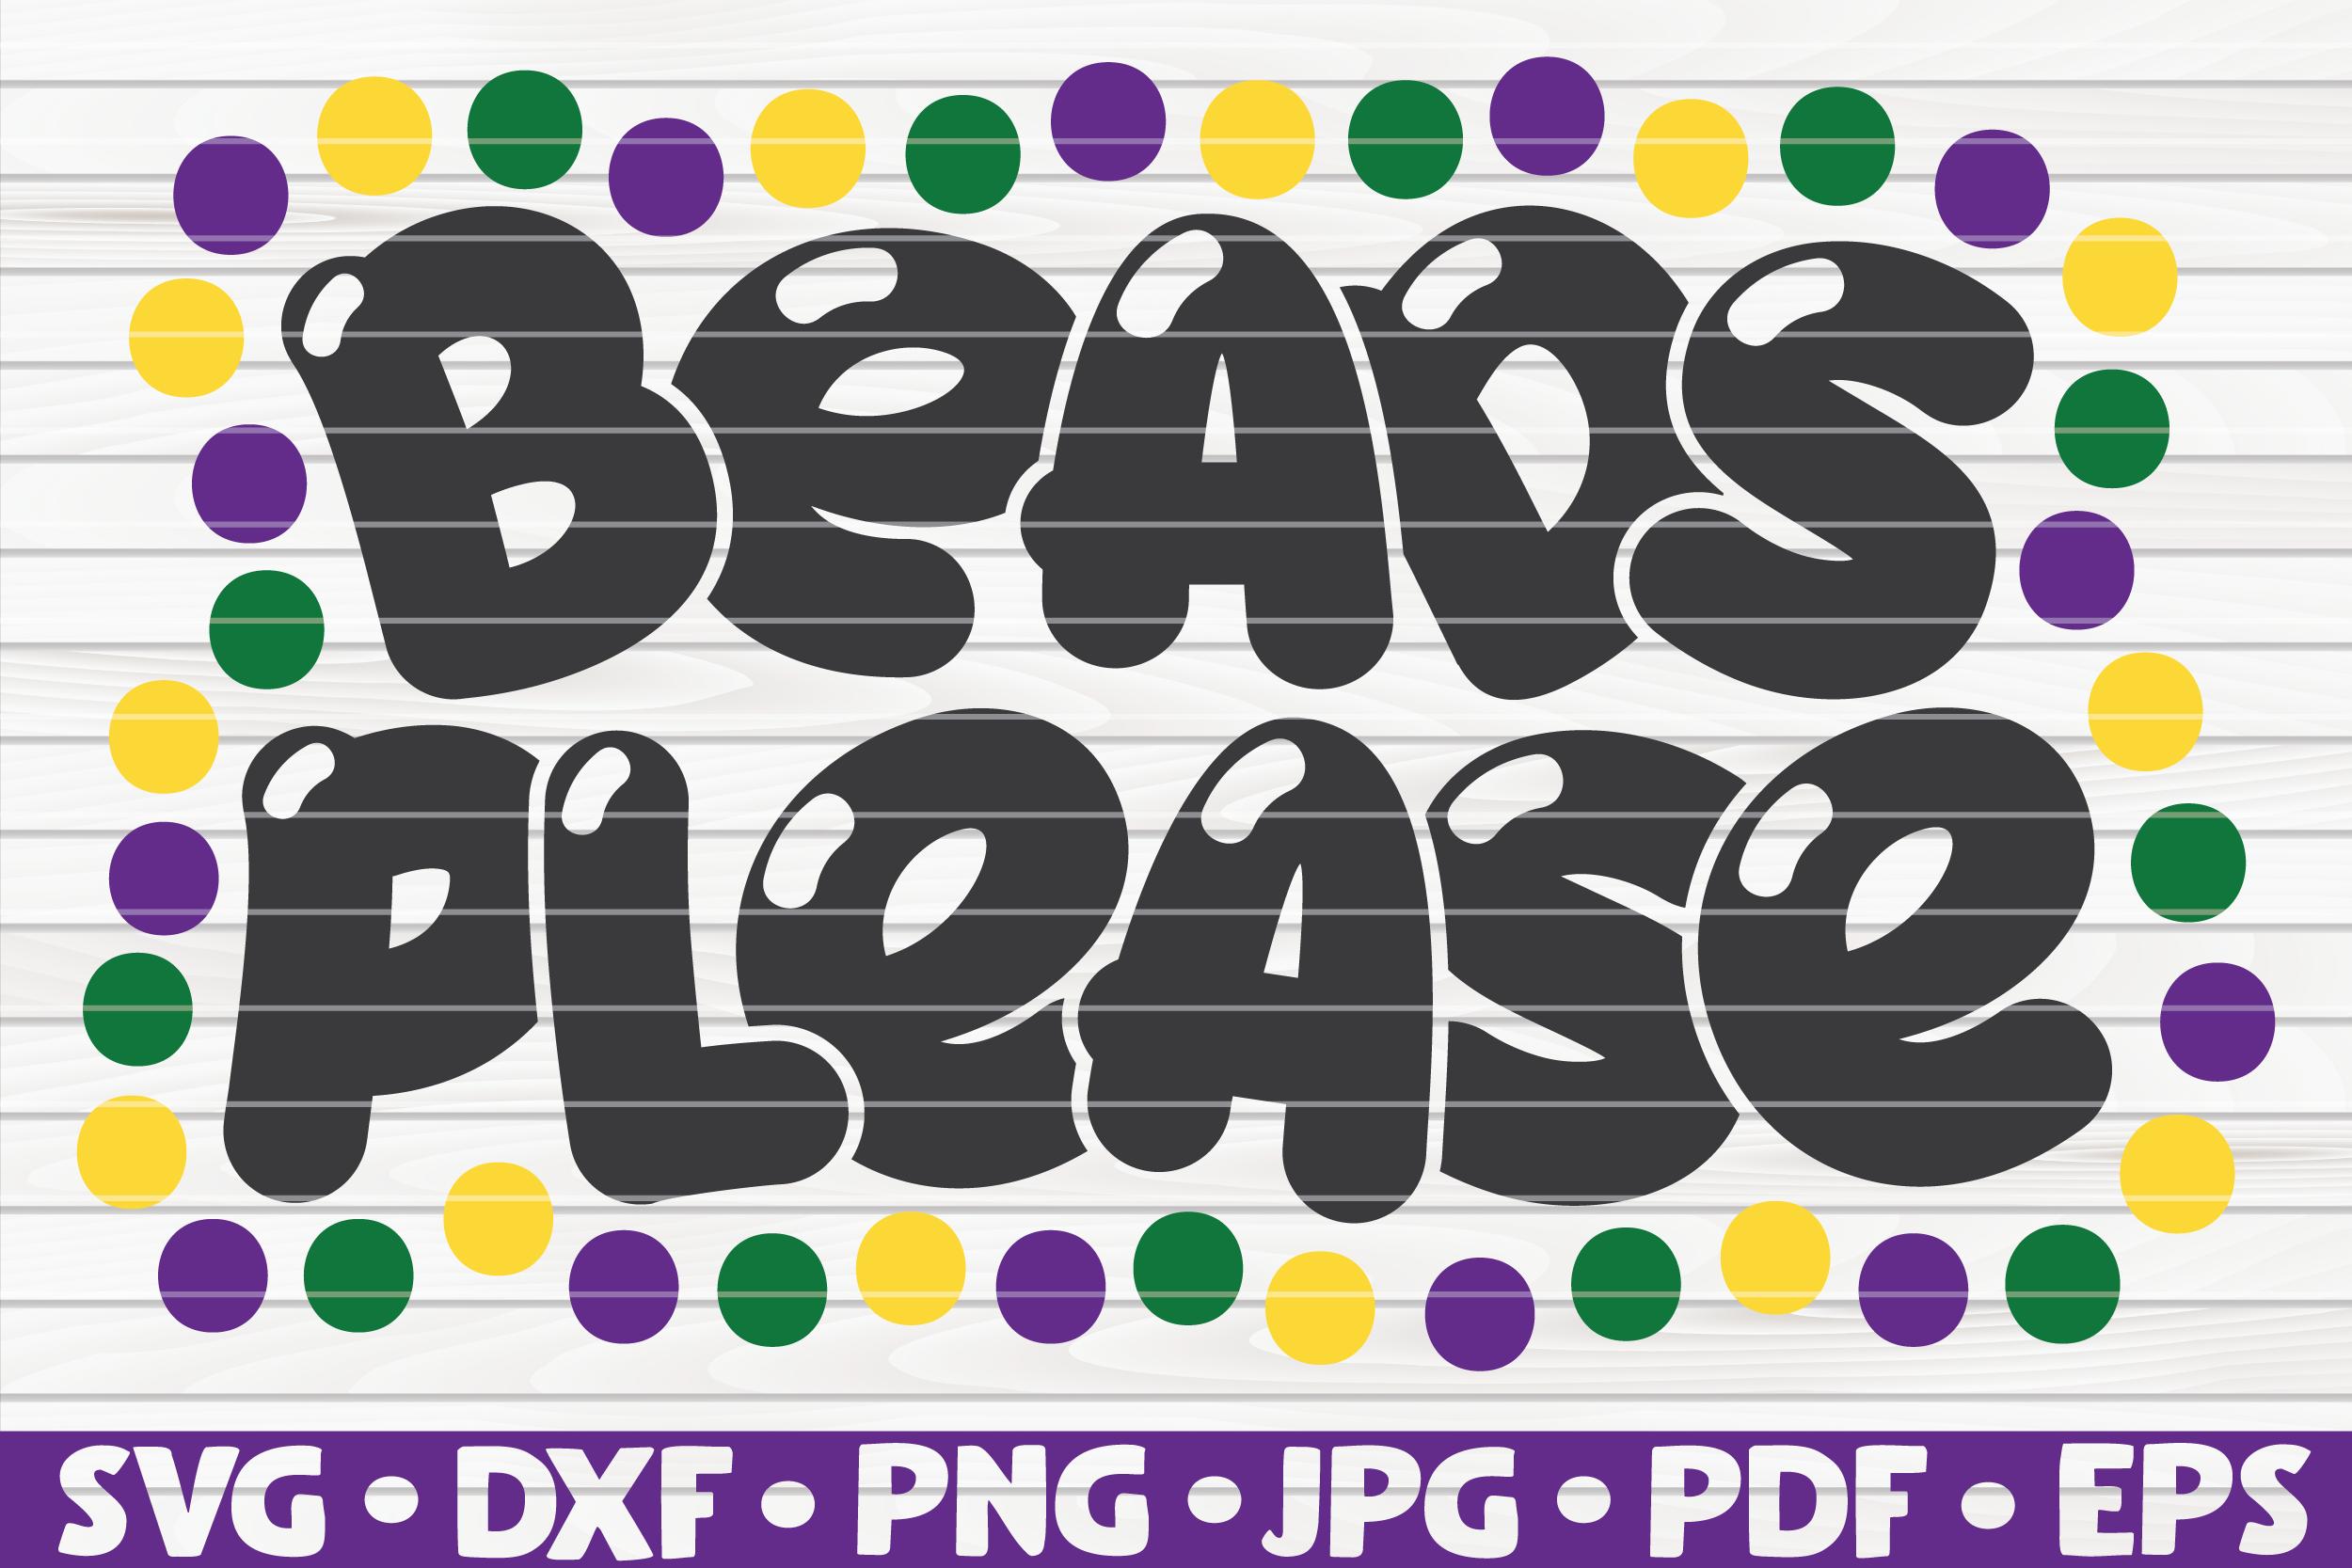 Beads Please| Mardi Gras saying | SVG | cut file example image 1